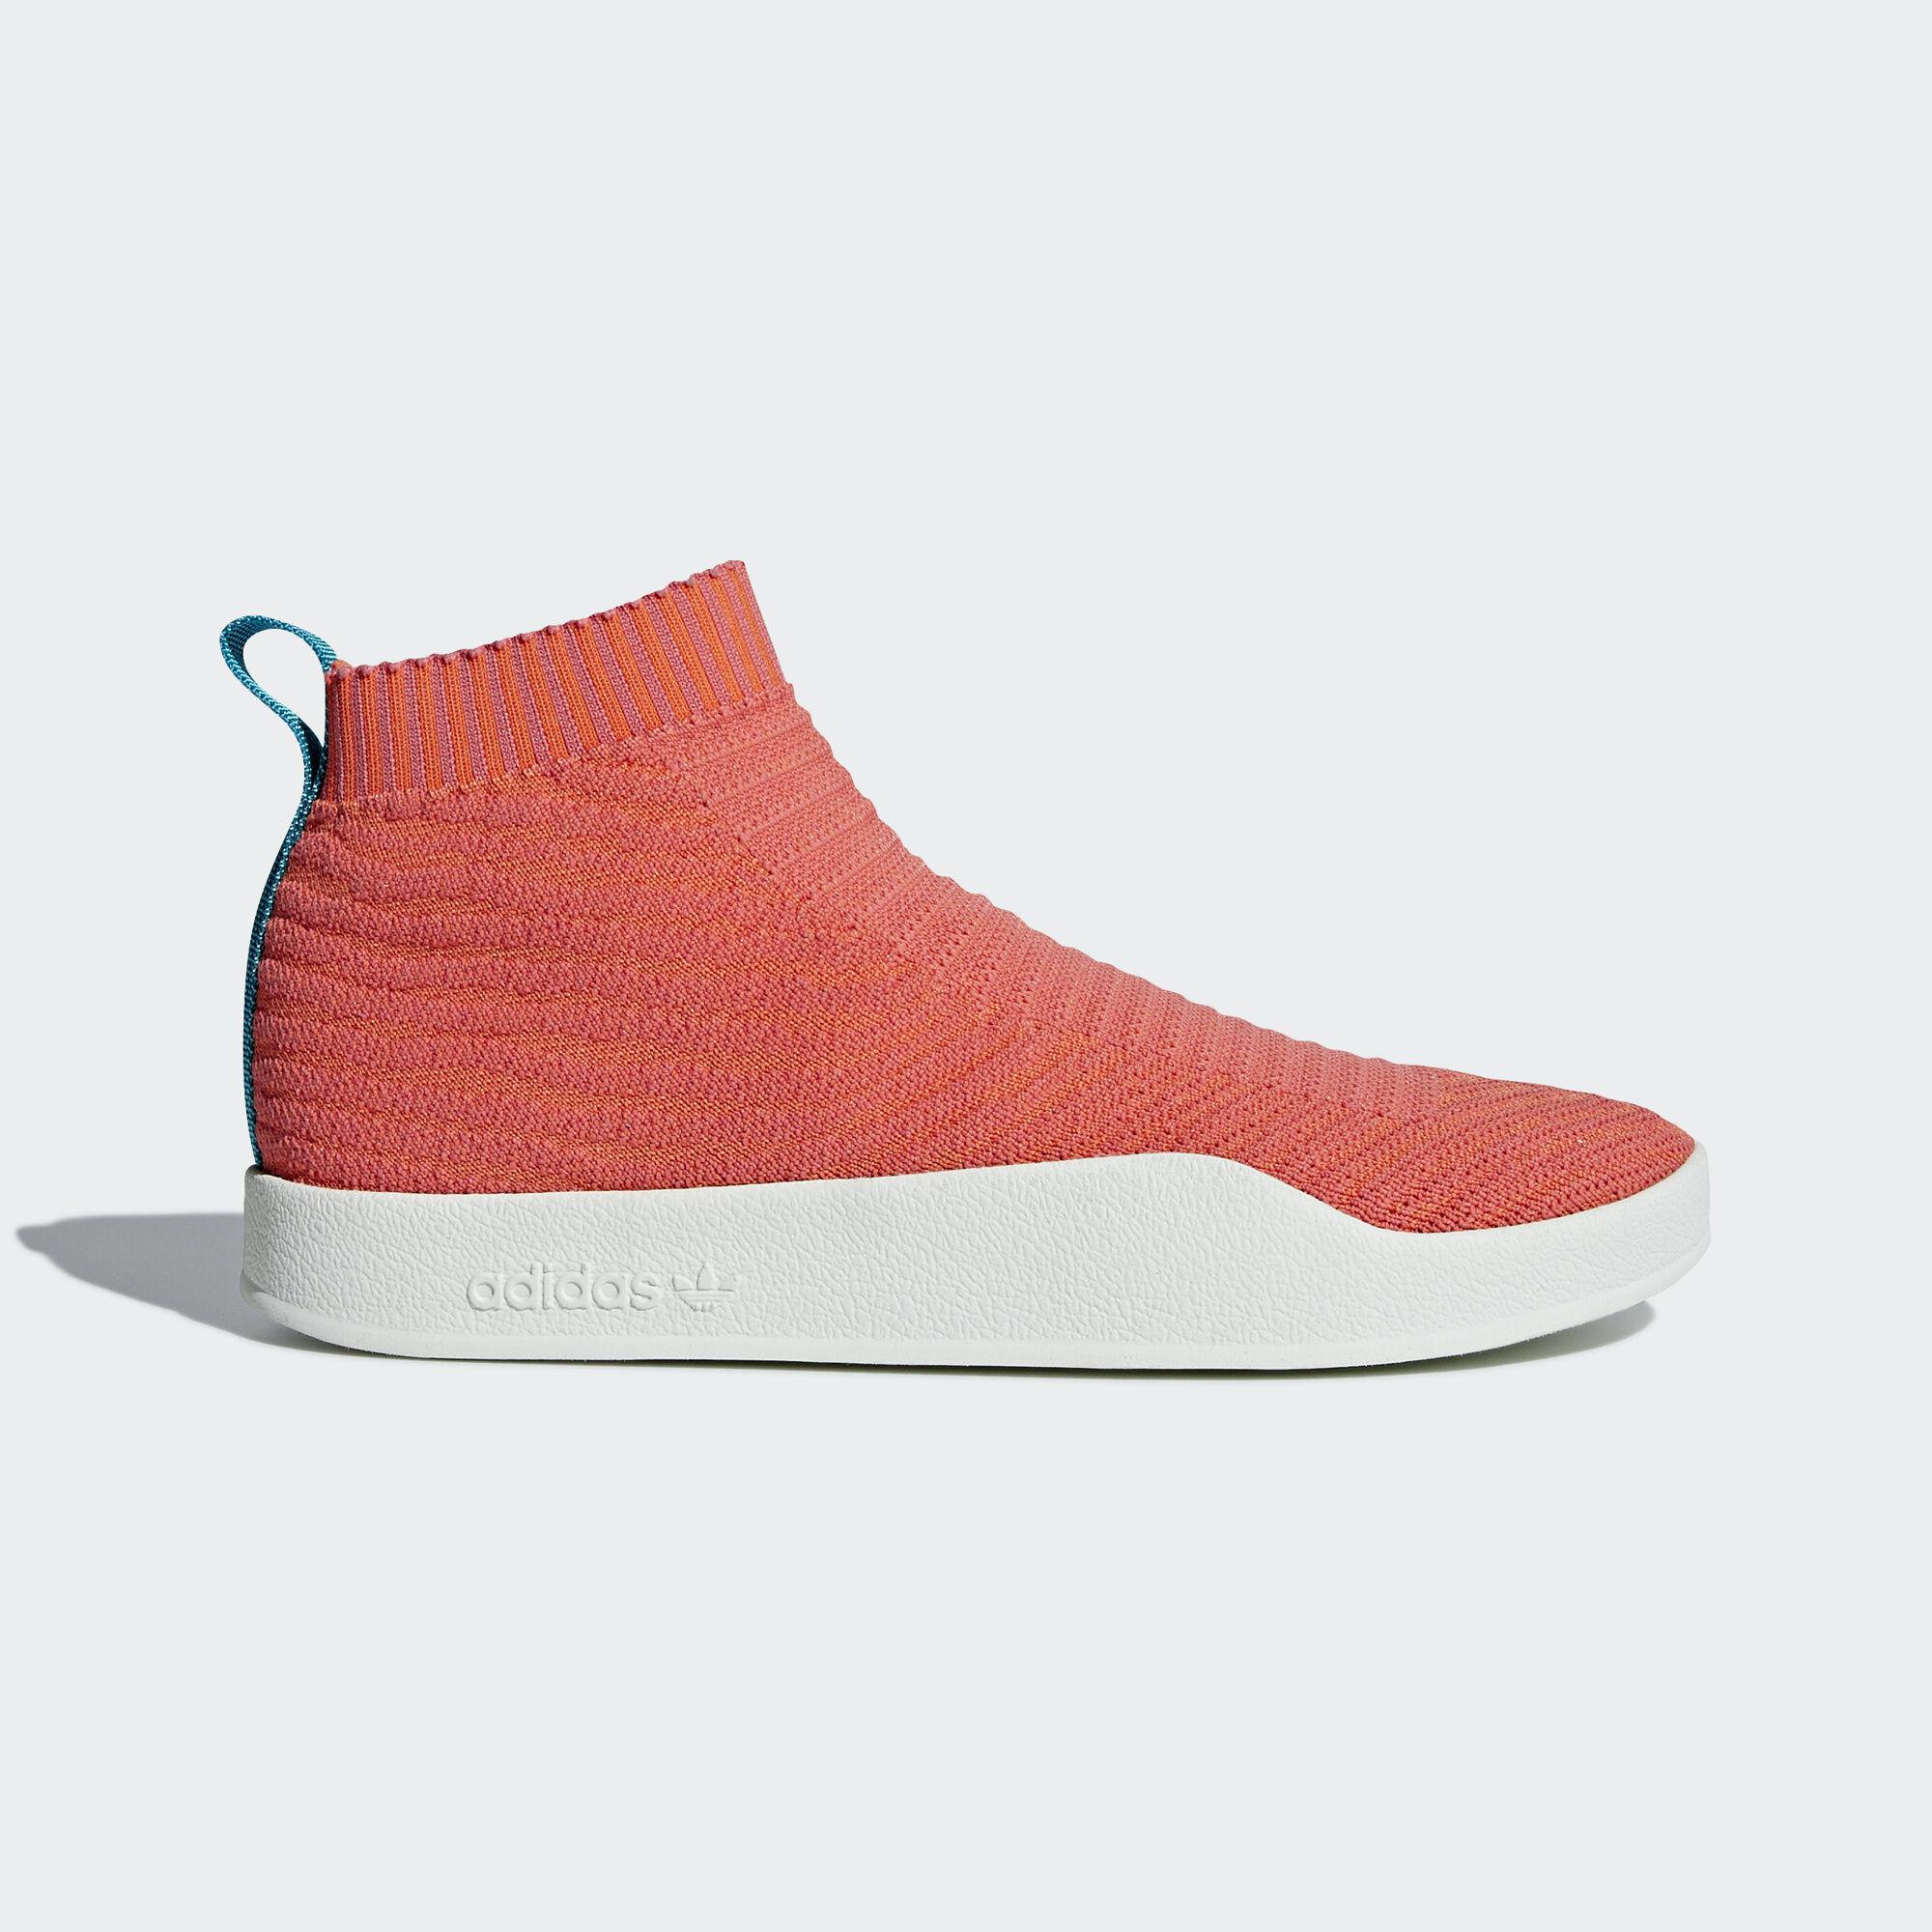 Adilette Chaussures Chaussette Primeknit UIktqVNZ